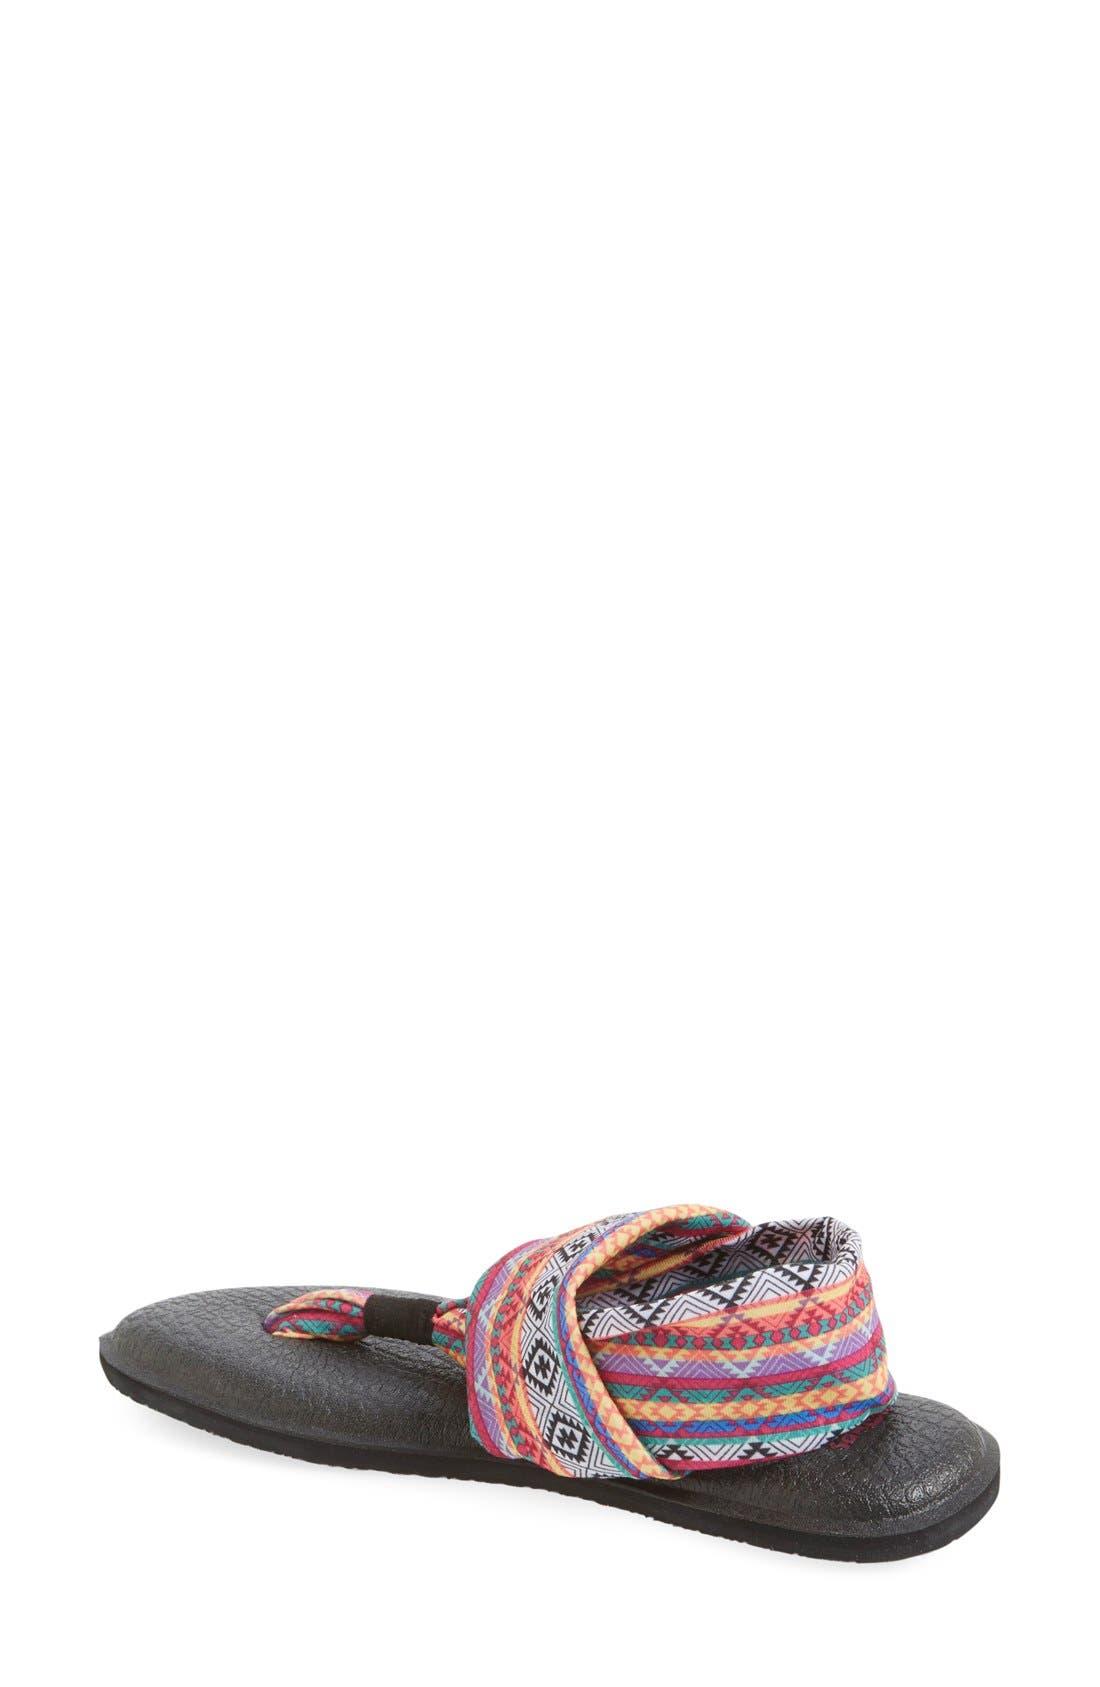 'Yoga Sling 2' Sandal,                             Alternate thumbnail 33, color,